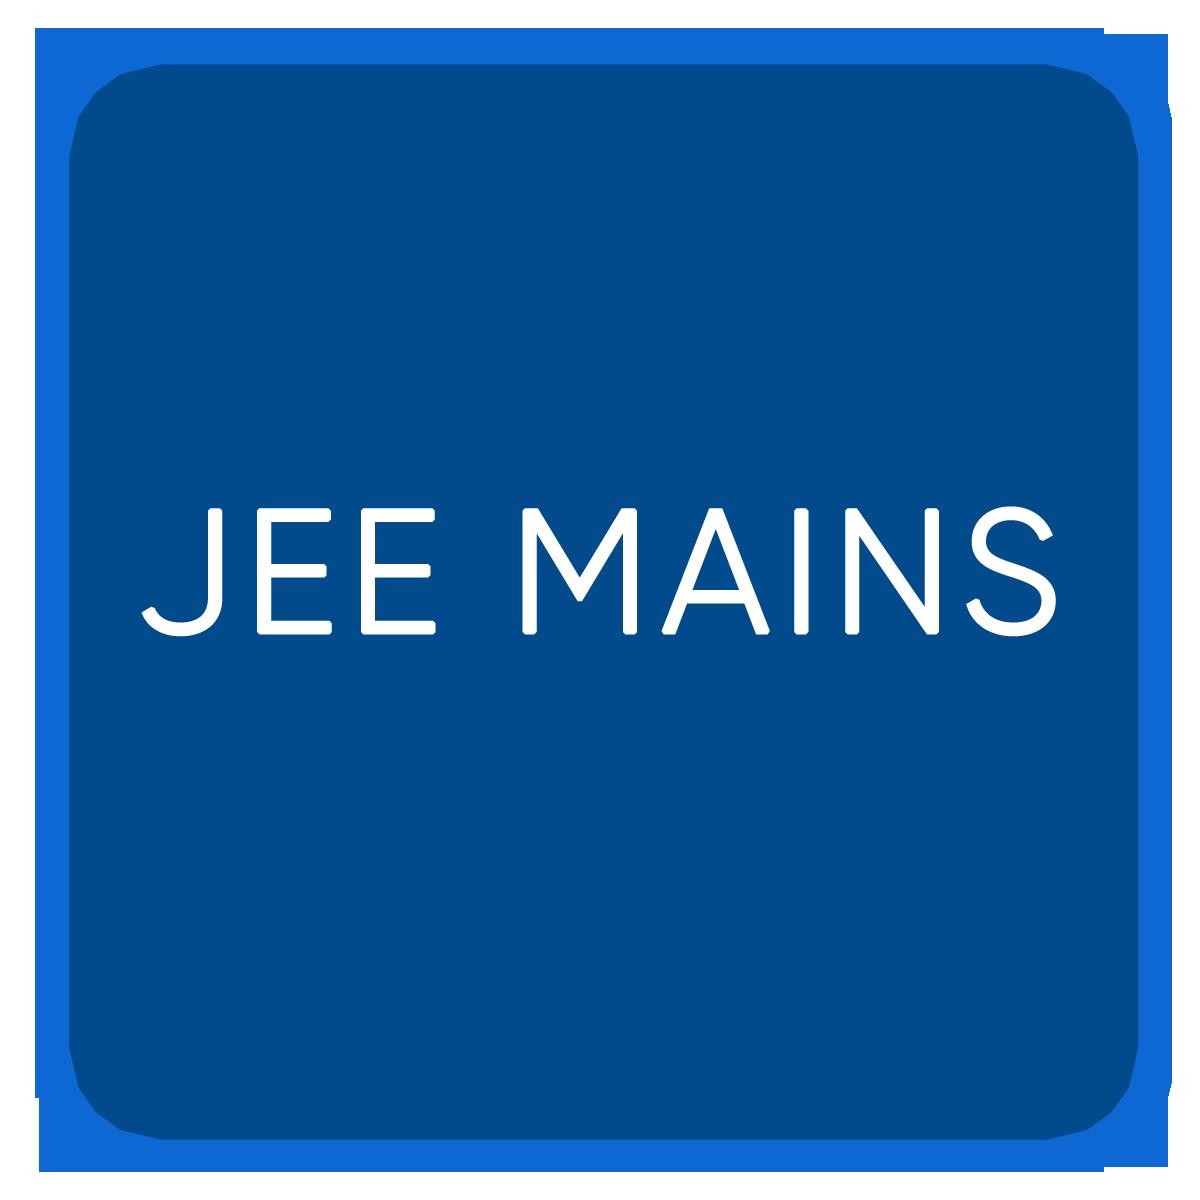 JEE Mains